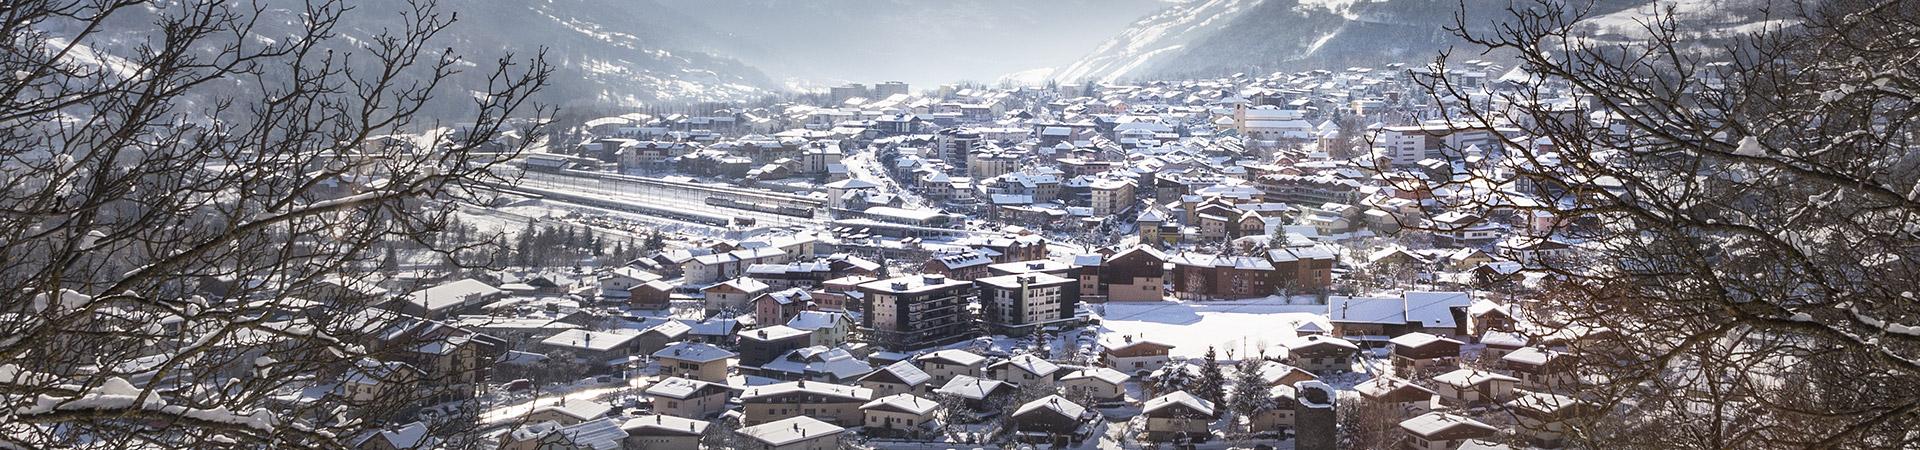 Bourg saint maurice station de ski les arcs for Bourg st maurice piscine